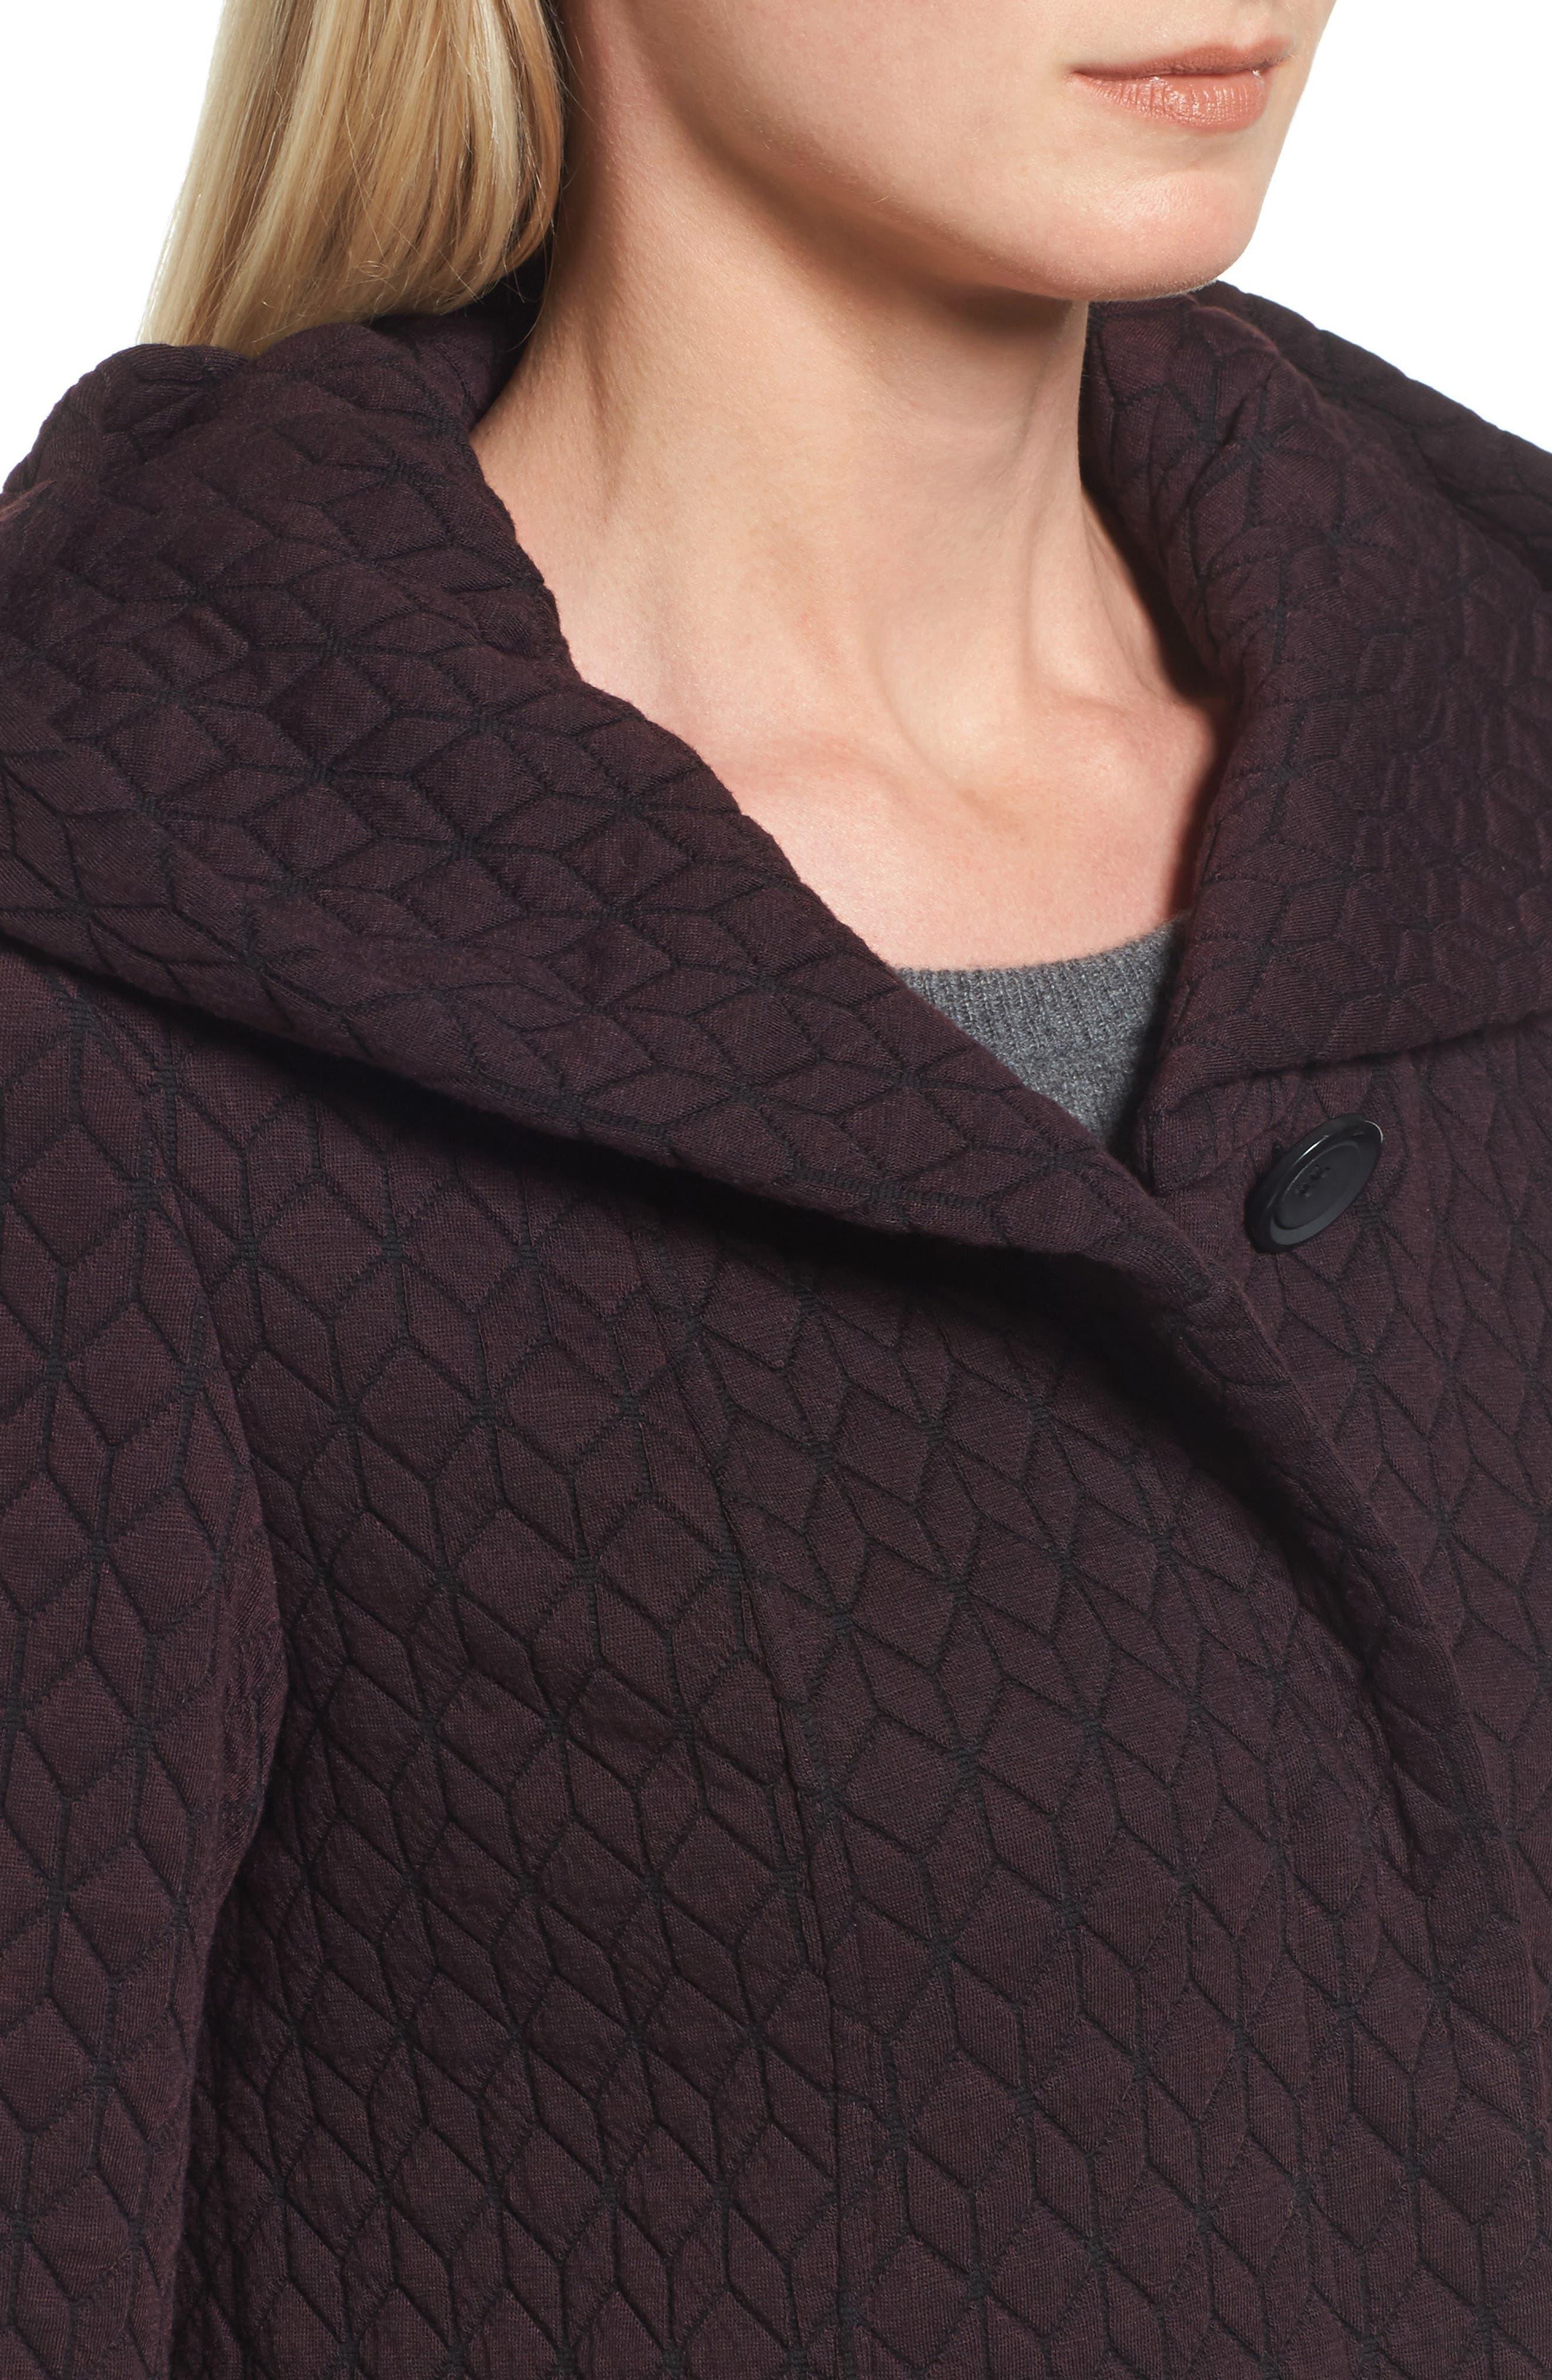 Cozy Knit Coat,                             Alternate thumbnail 4, color,                             Burgundy